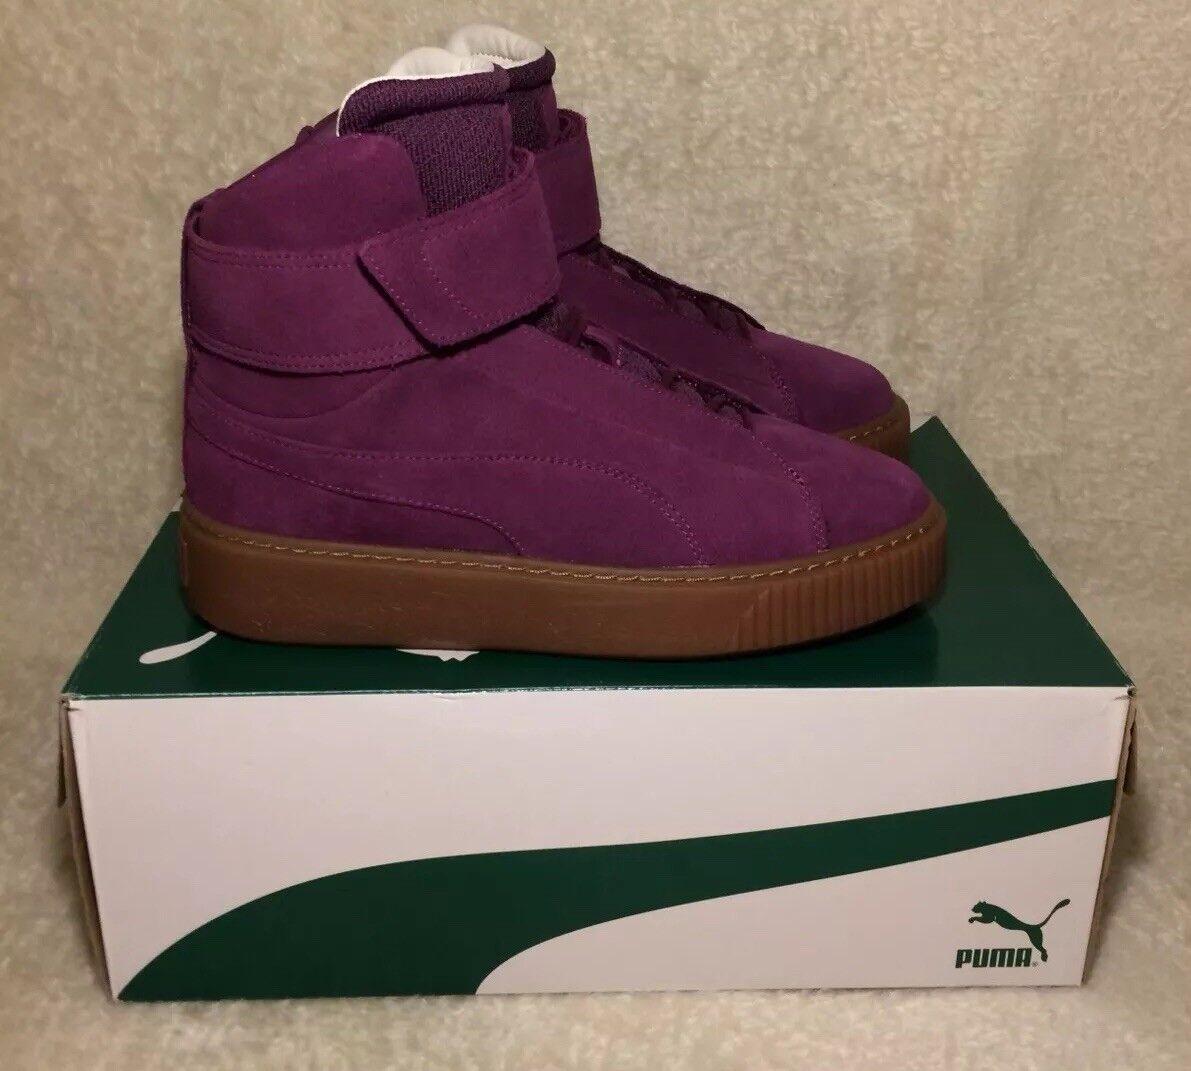 puma platform mid OW 364588 02 Women's Trainers Dark Purple Size 5uk Boots Rare